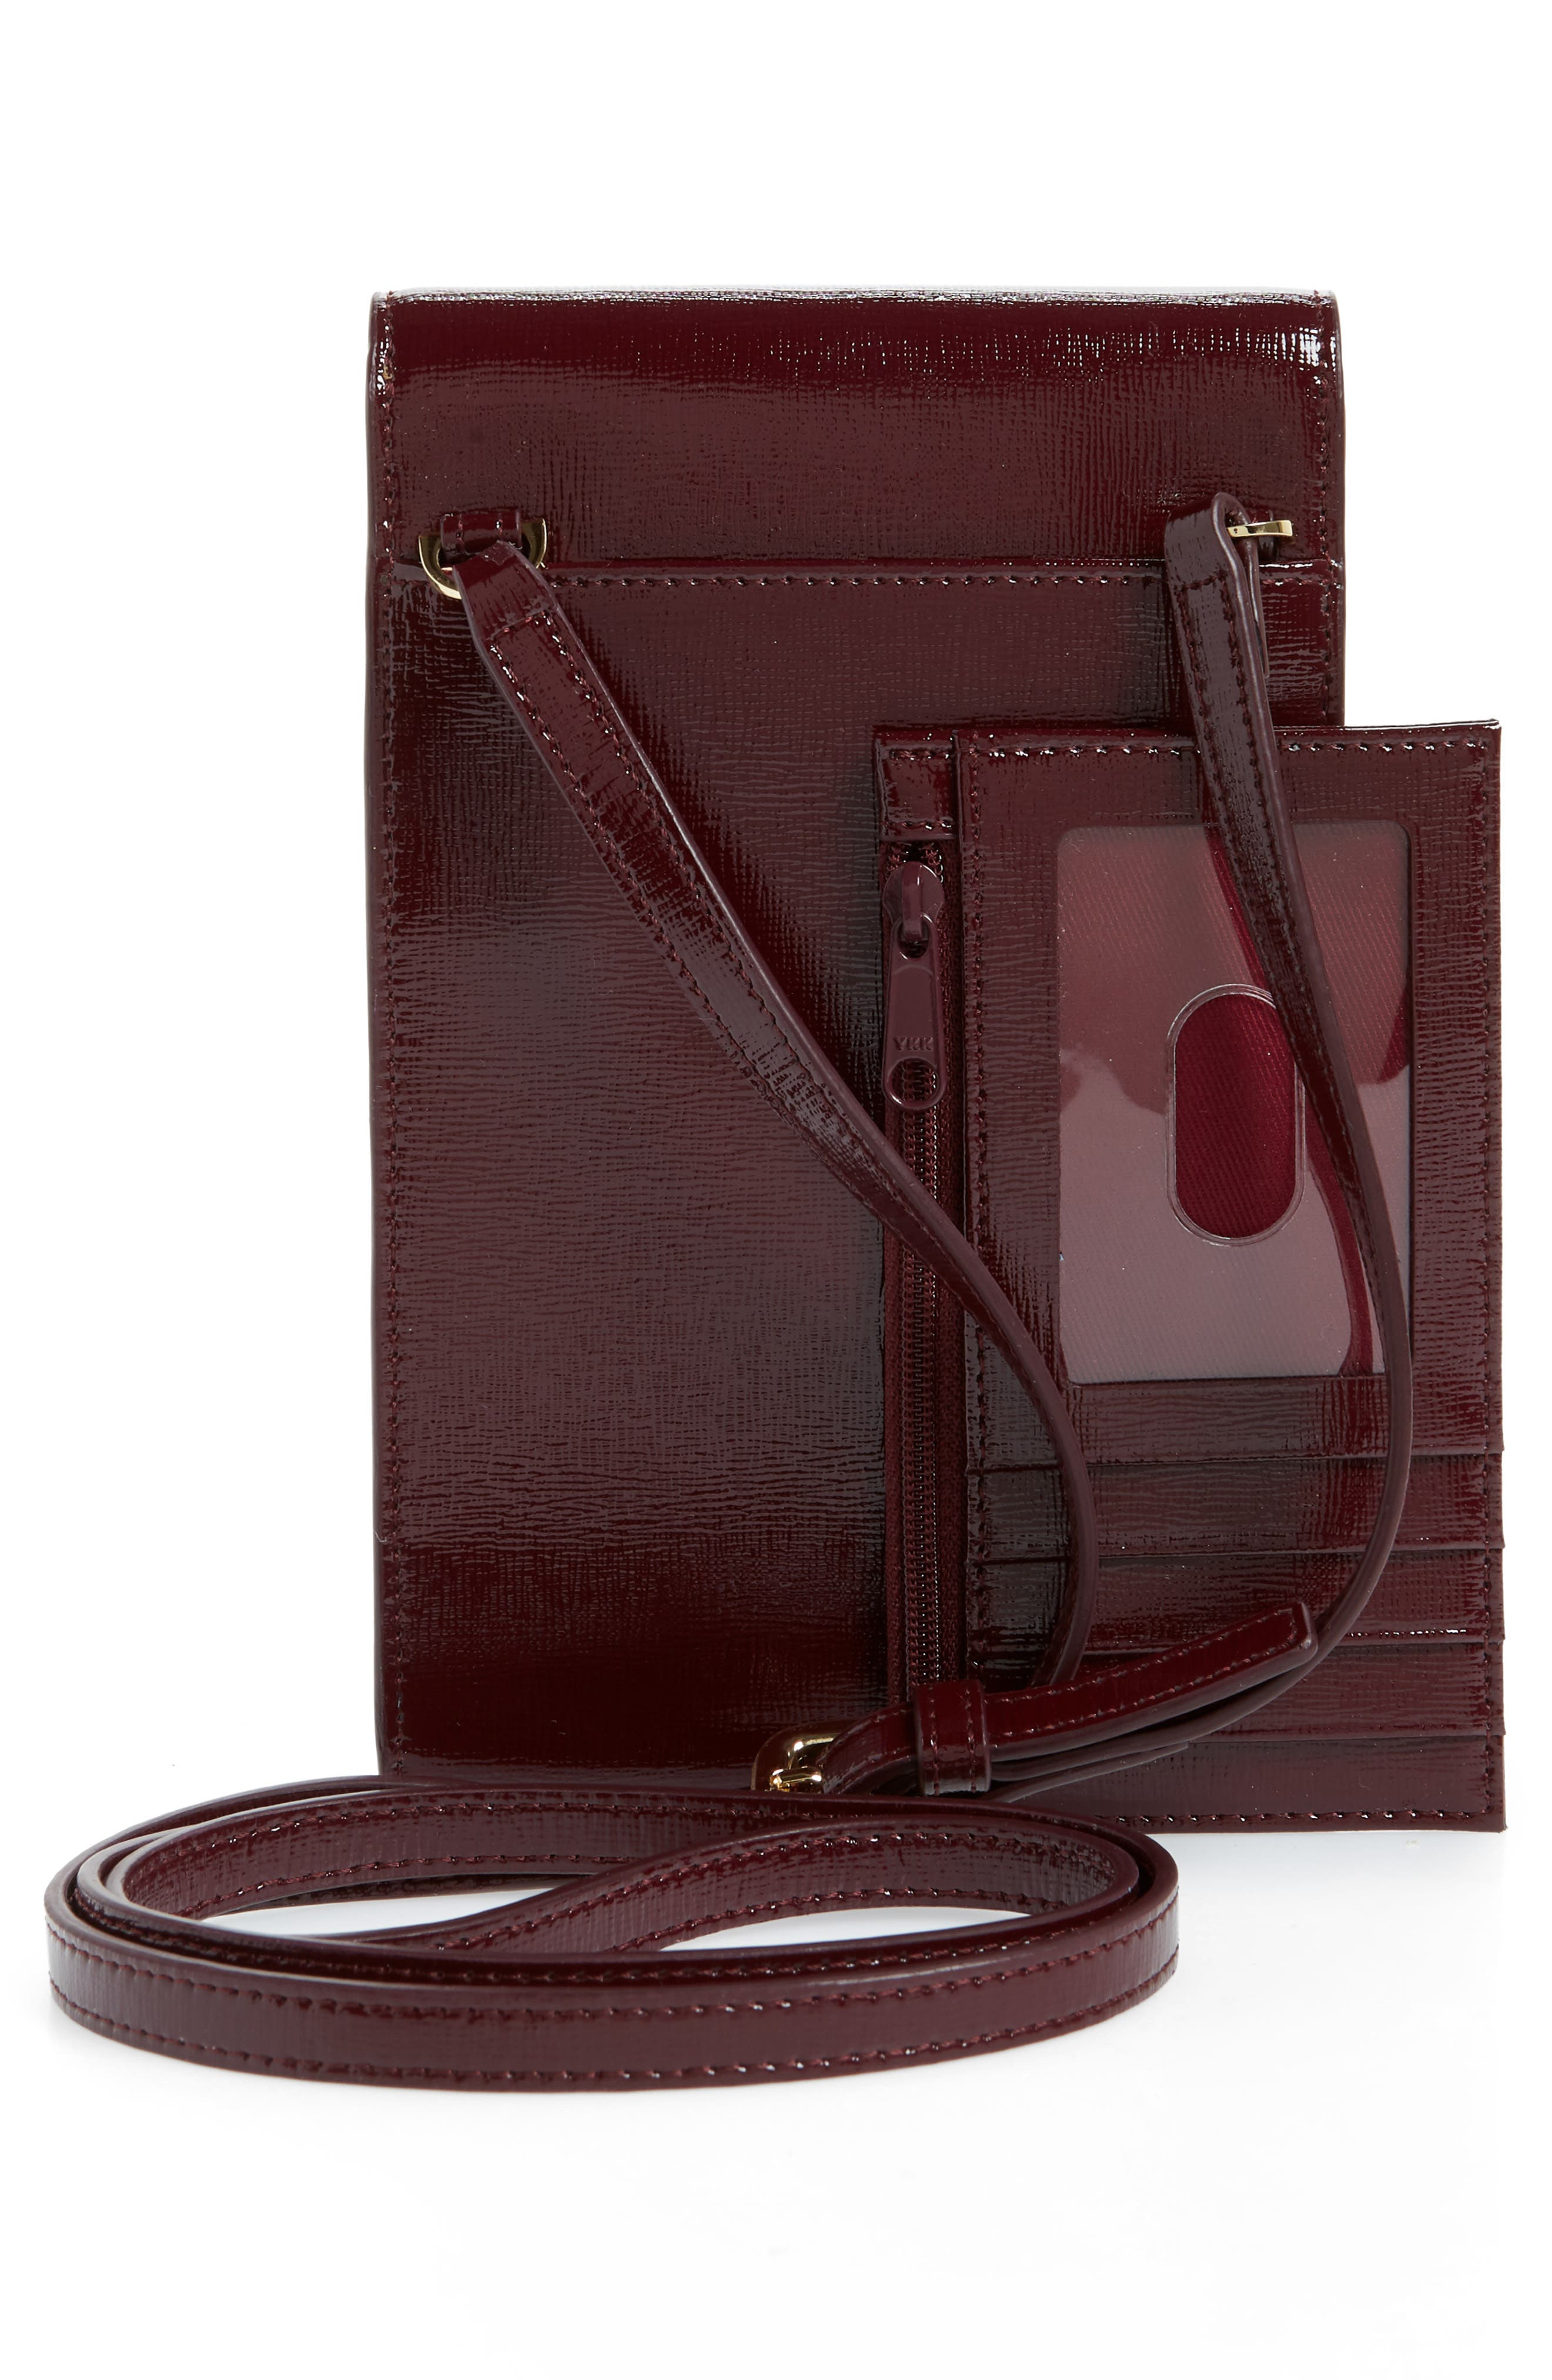 Leather Phone Crossbody Bag,                             Alternate thumbnail 3, color,                             Burgundy Royale